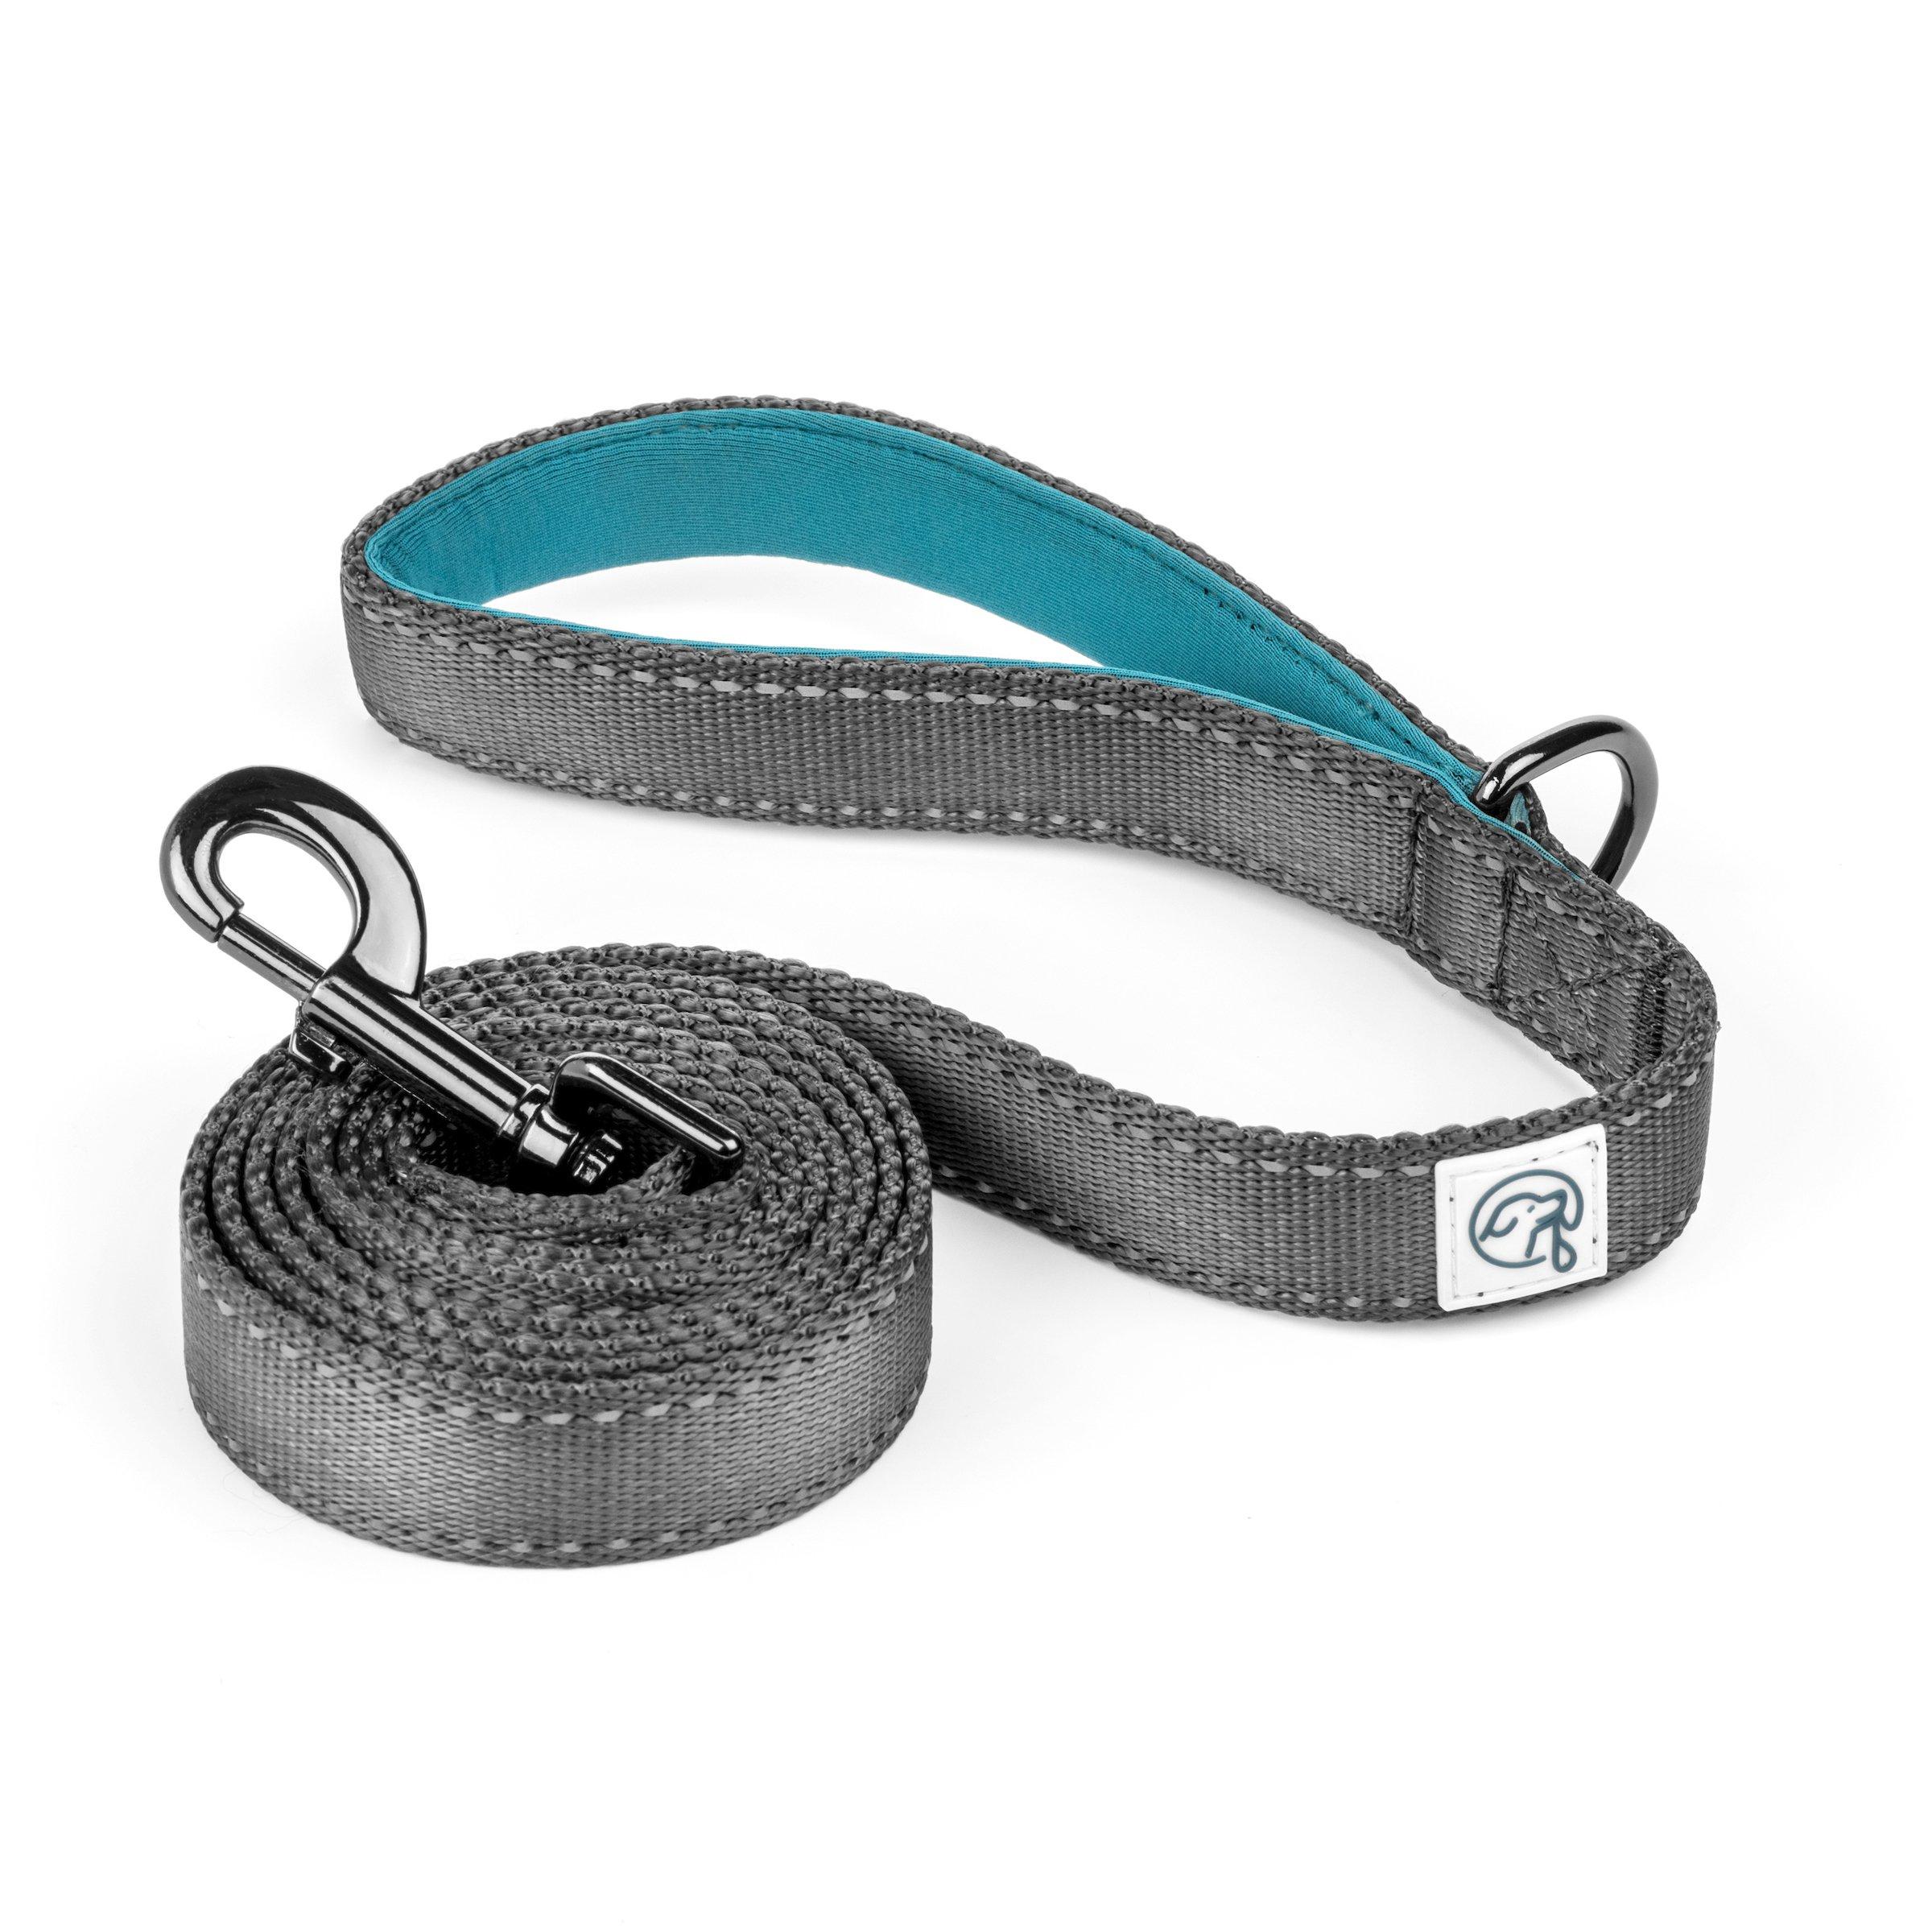 Embark Explorer Pet/Dog Leash with Soft Padded Handle - 5 Foot Length (Teal Blue)